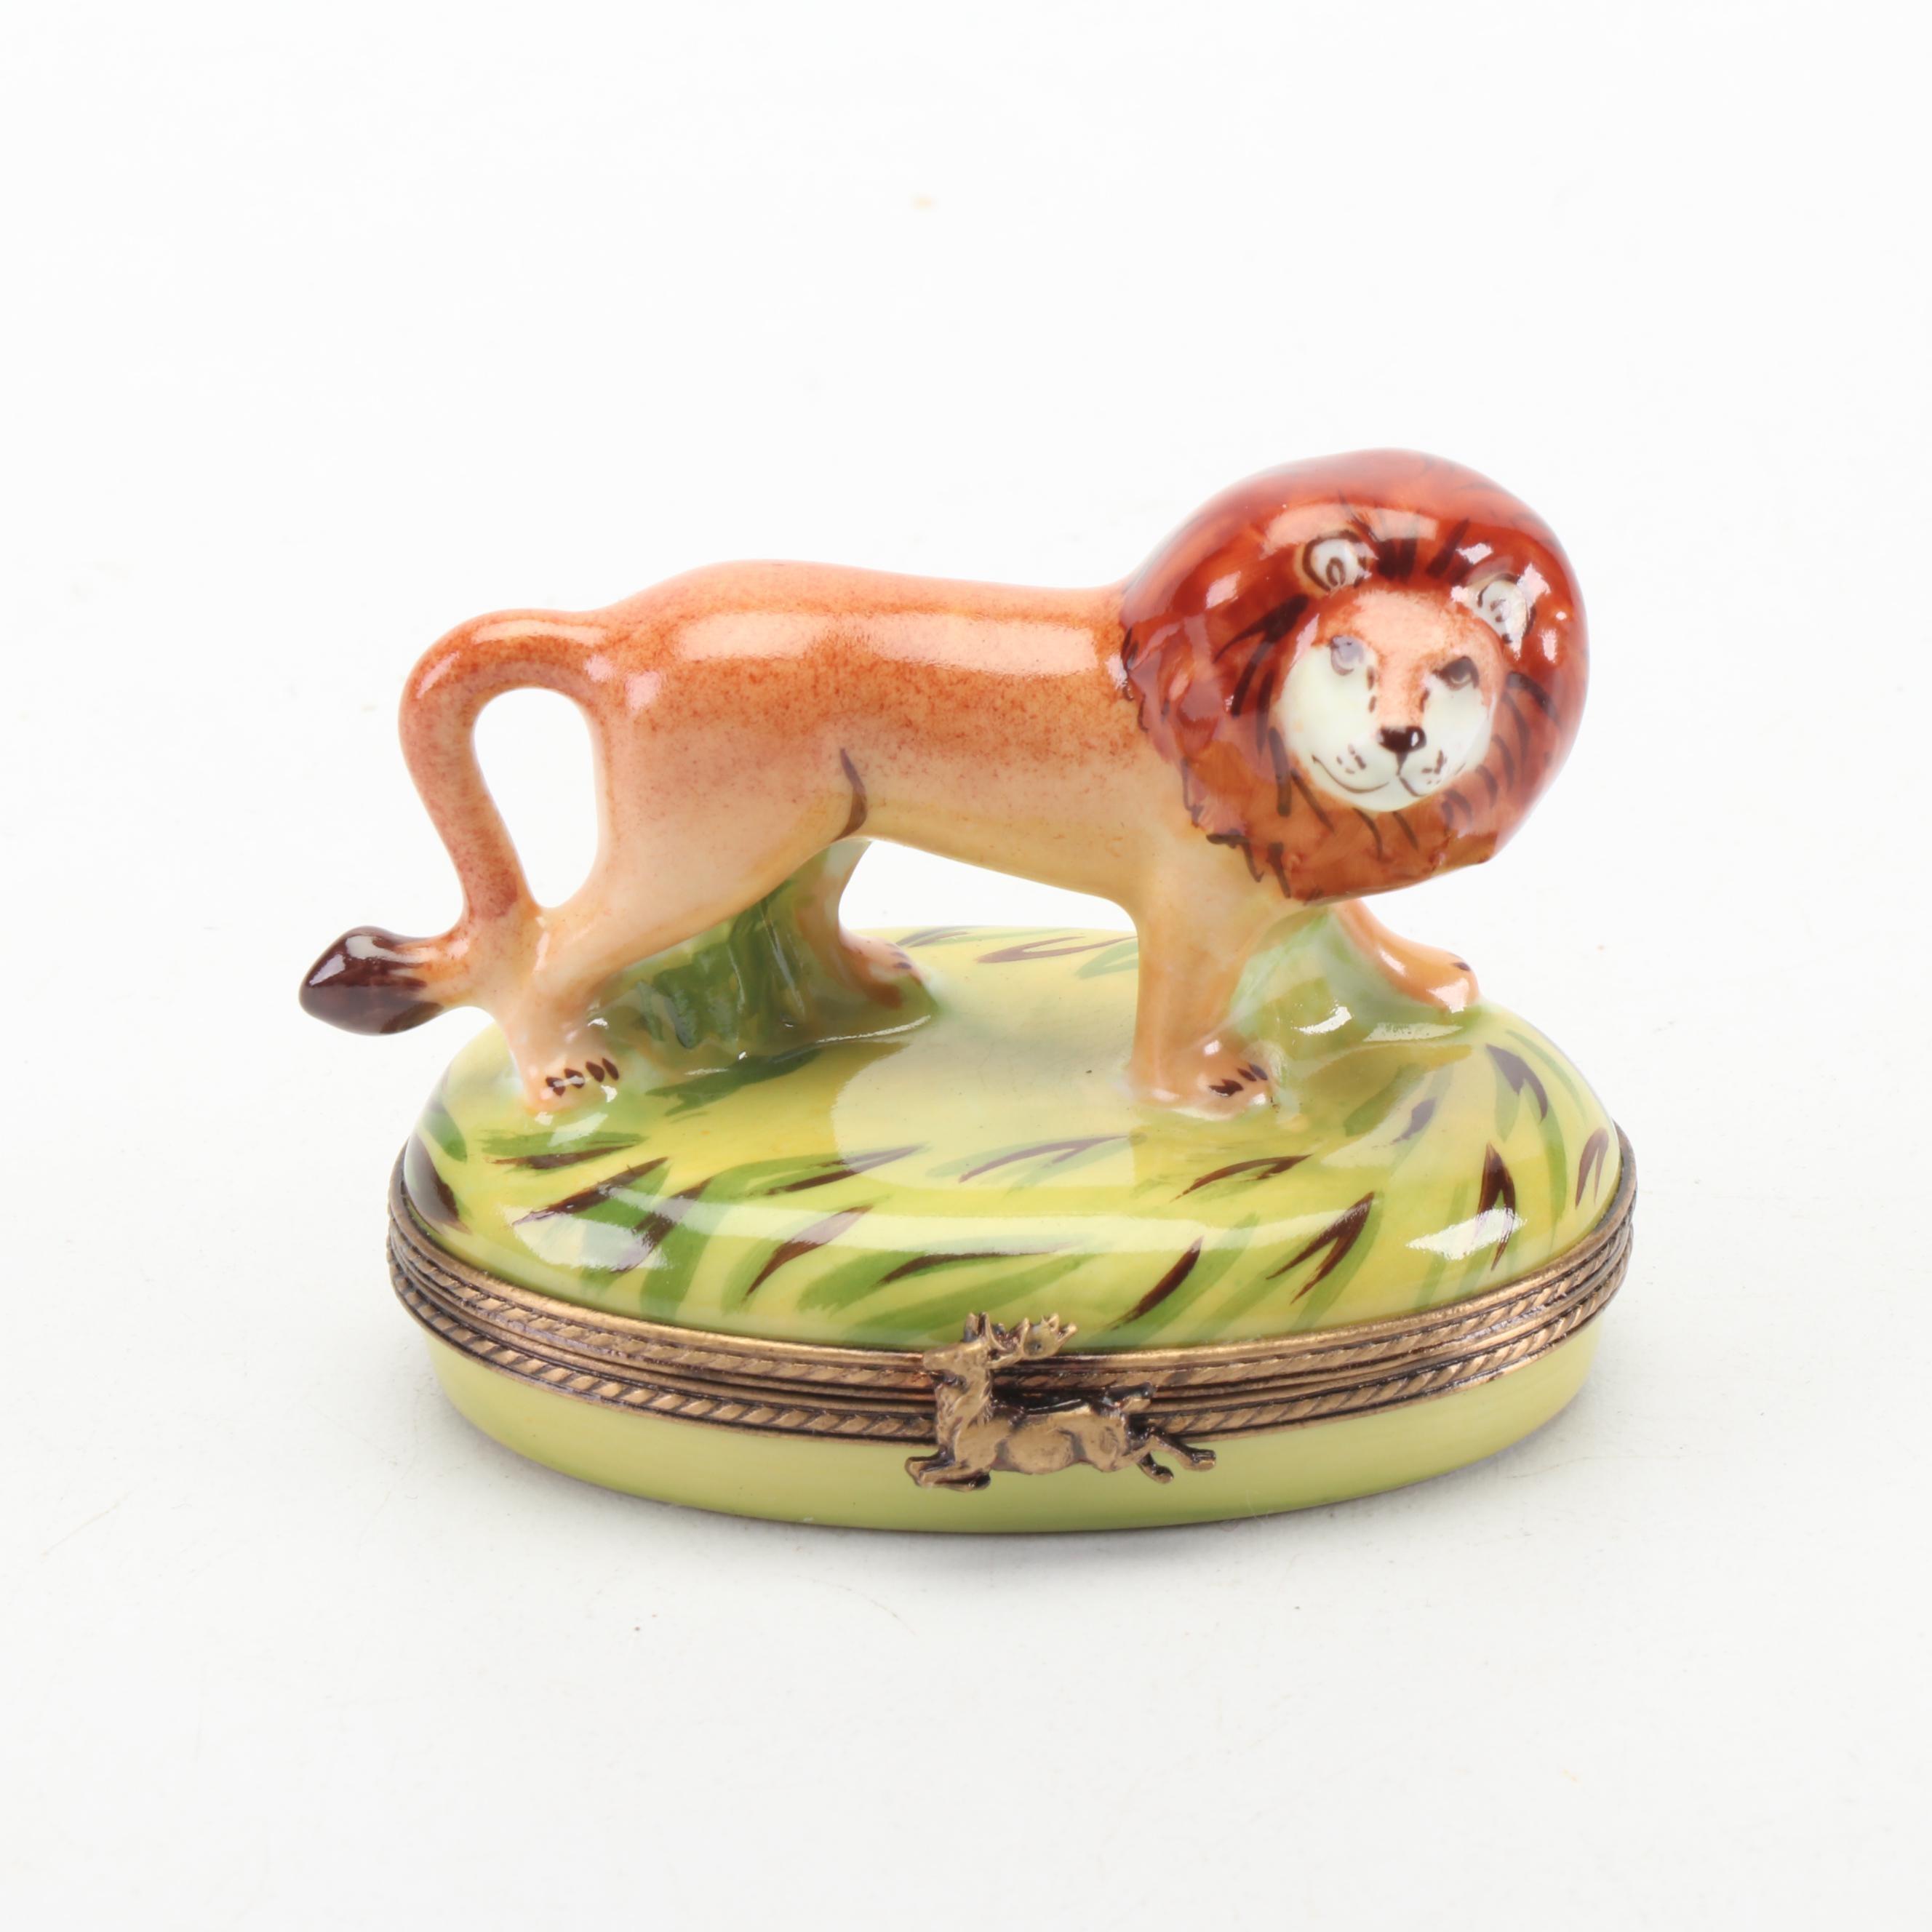 Limoges Hand-Painted Lion Shaped Porcelain Trinket Box